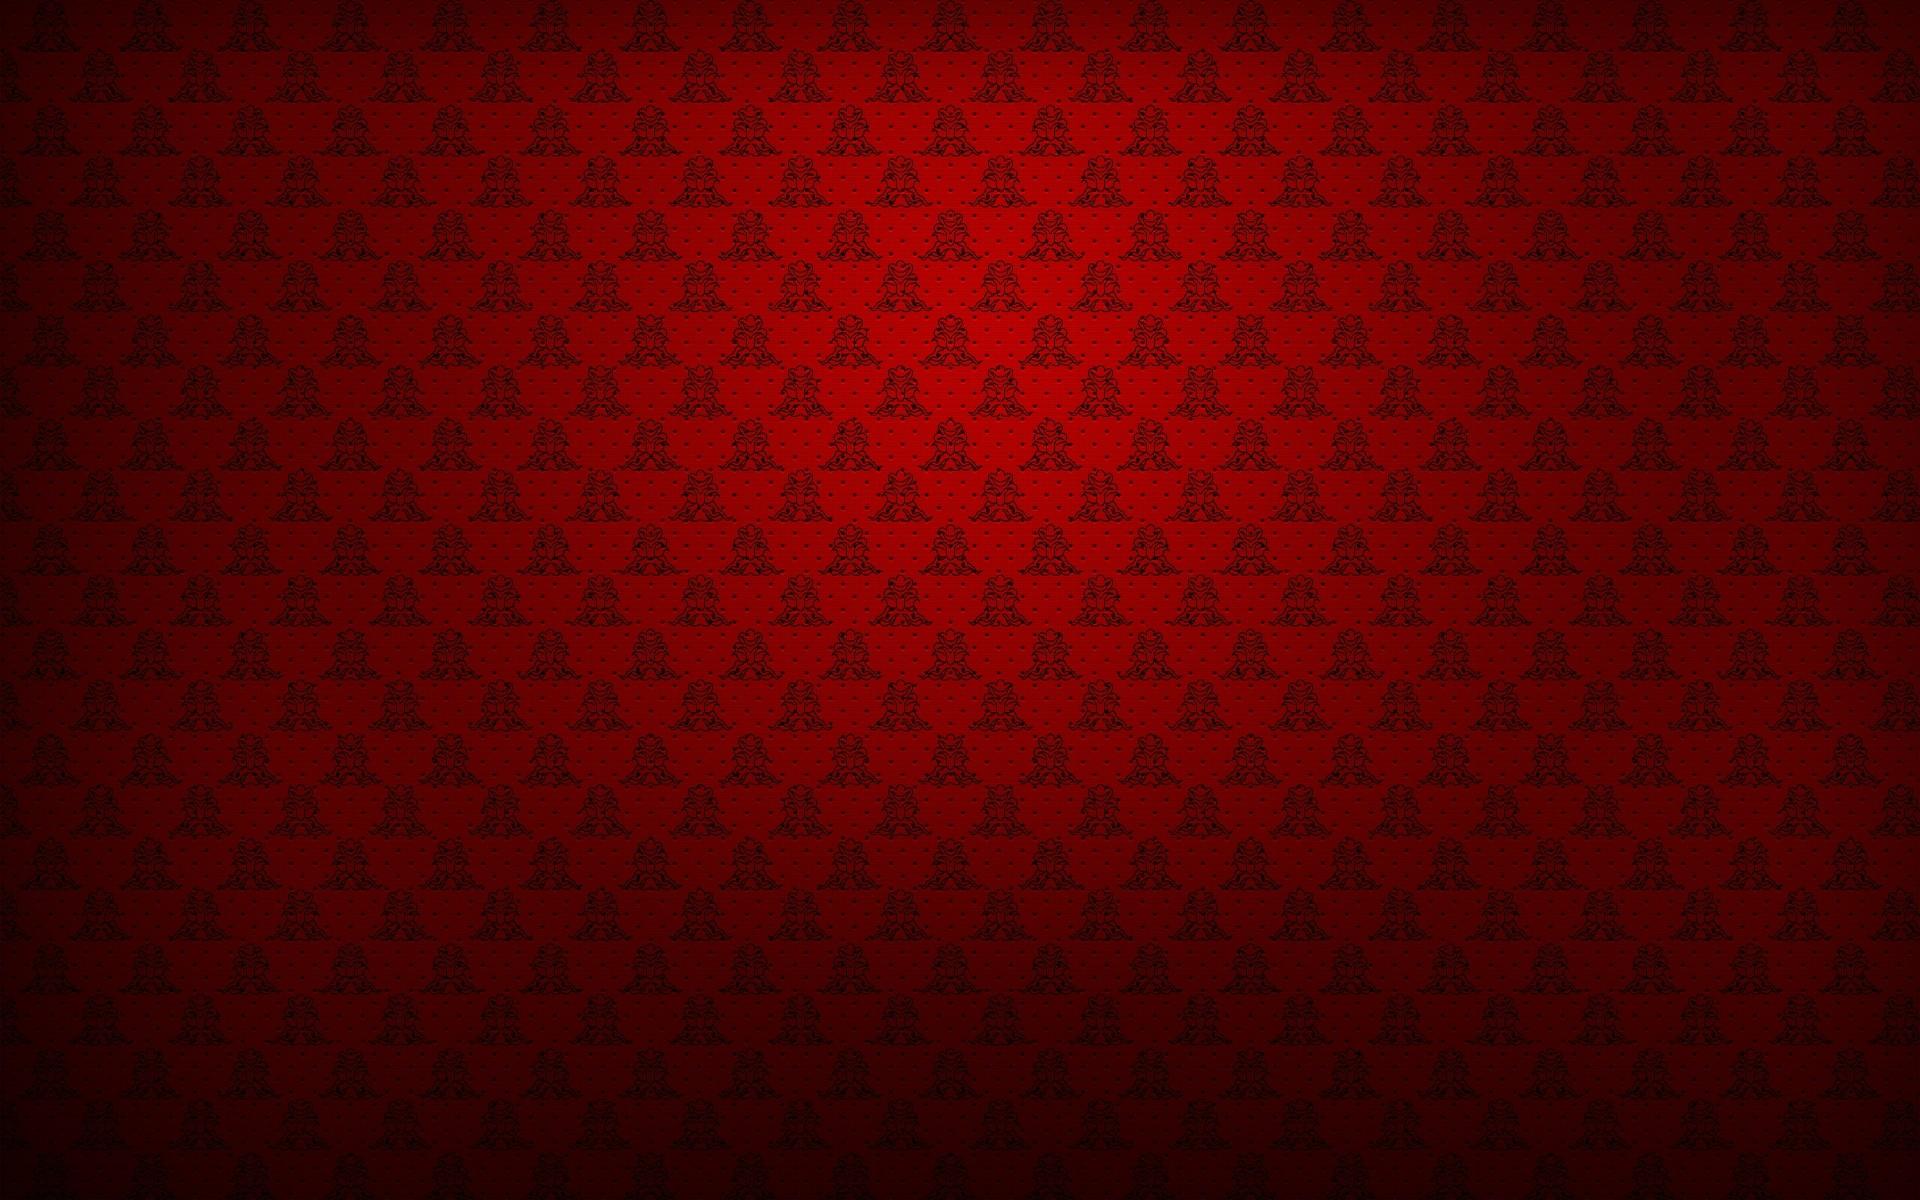 Free Download Red Patterns Wallpaper 1920x1200 Red Patterns